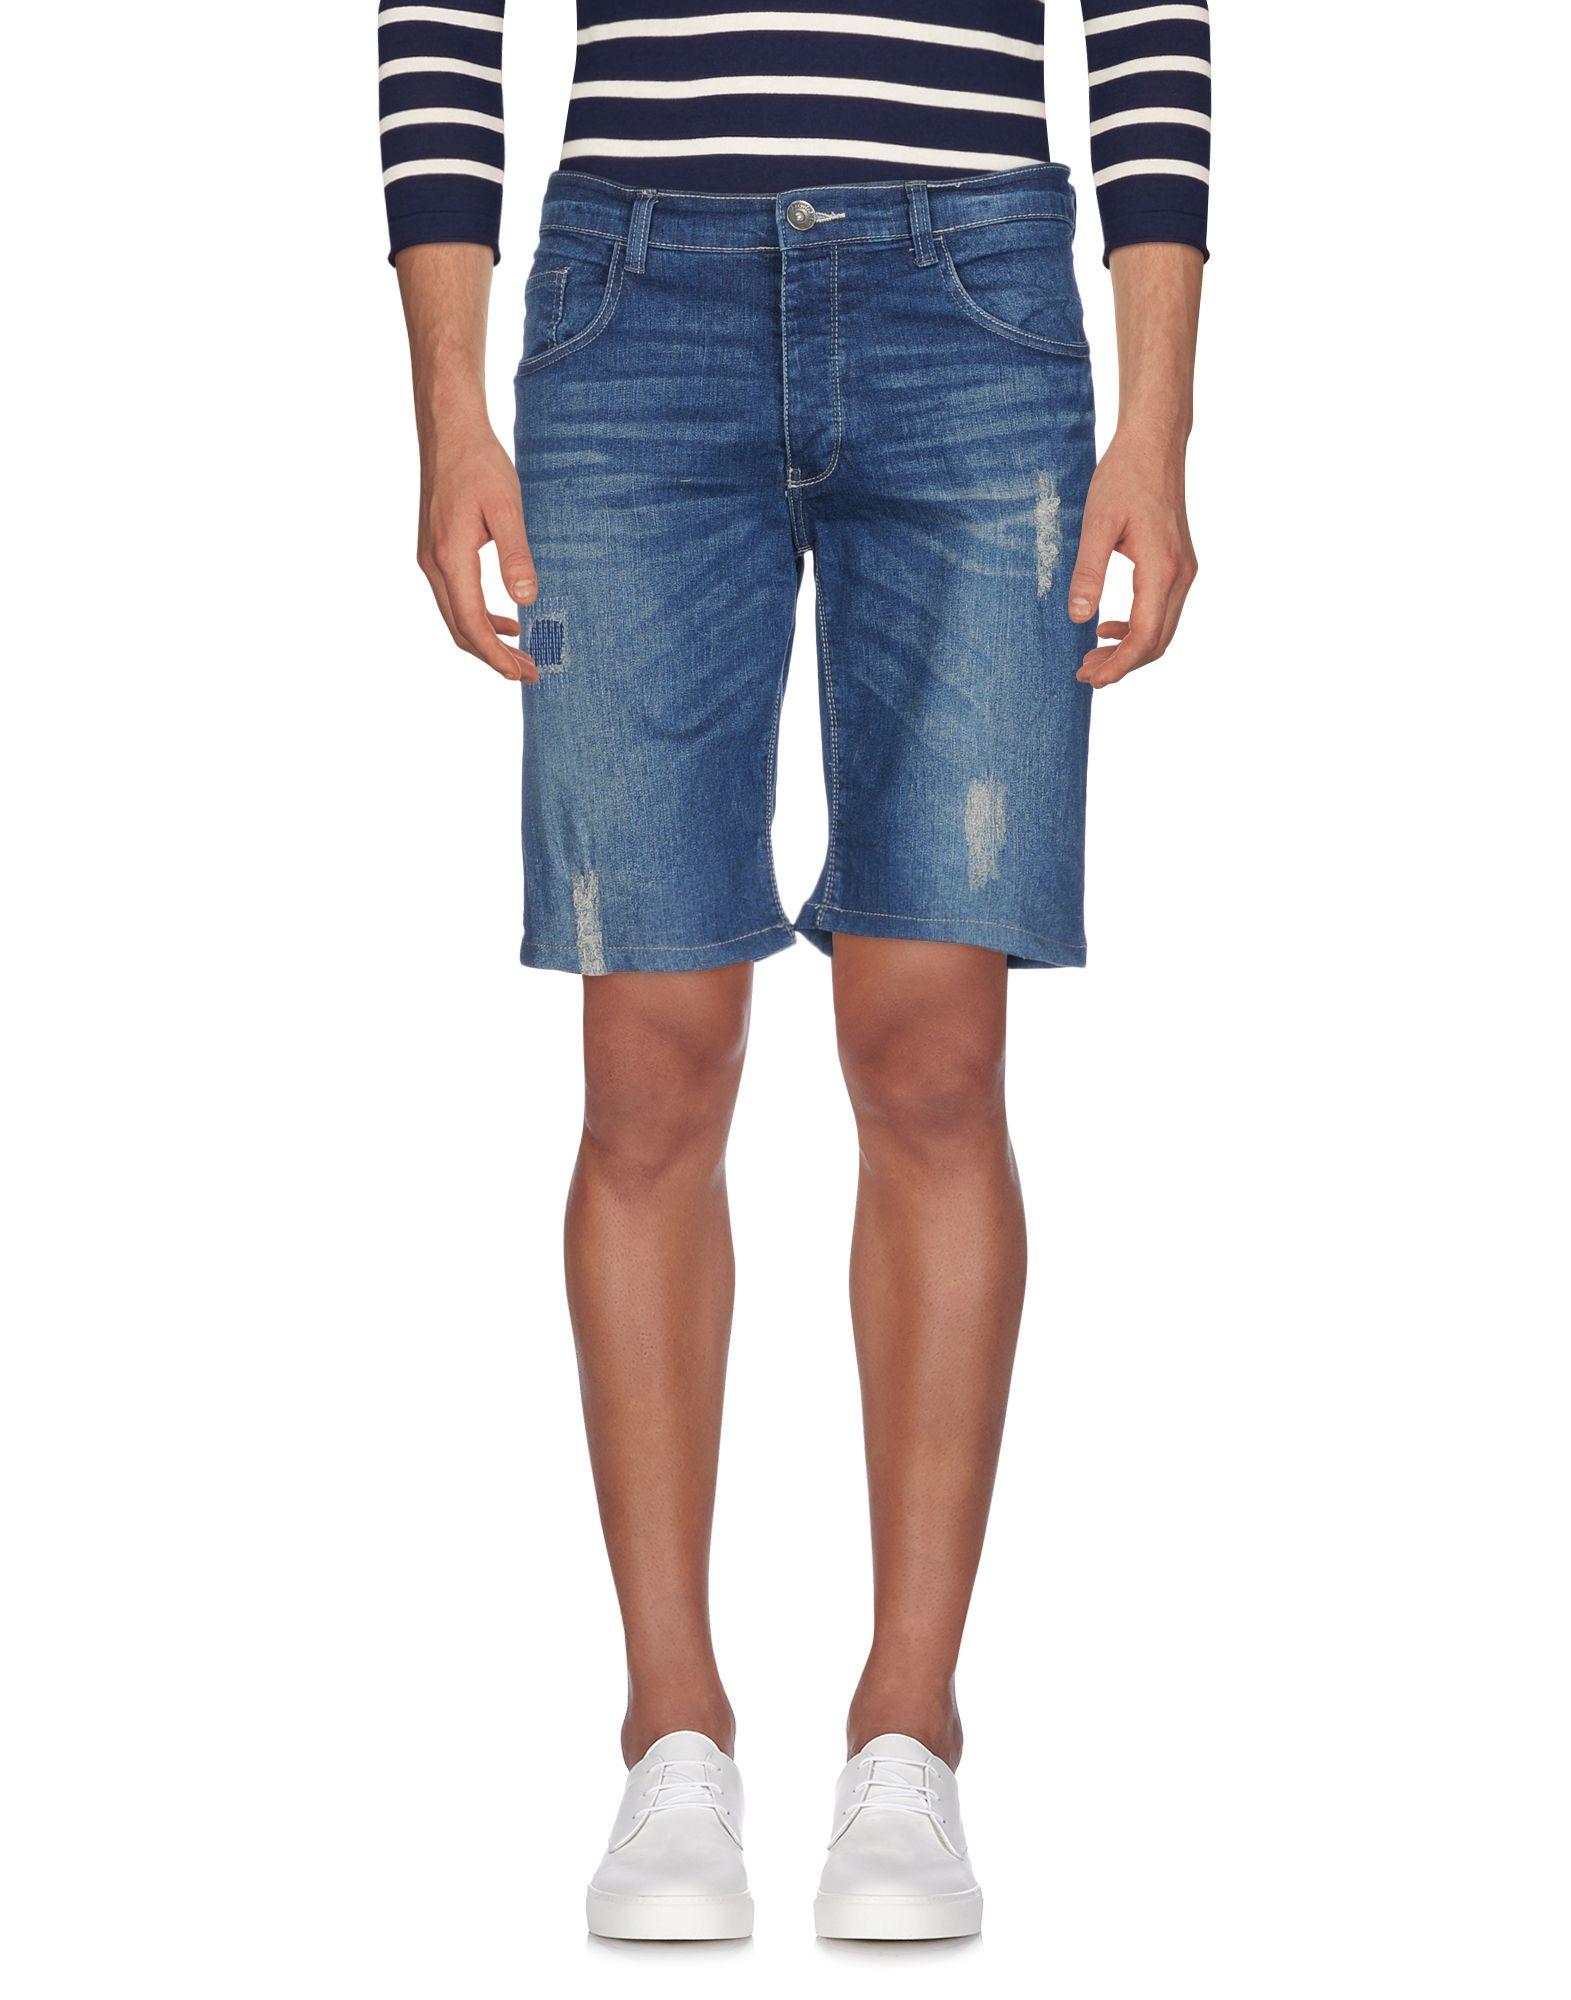 TROUSERS - Bermuda shorts R.A.W. RECYCLED ART WORLD Good Selling Buy Cheap Newest CHbclYzZU